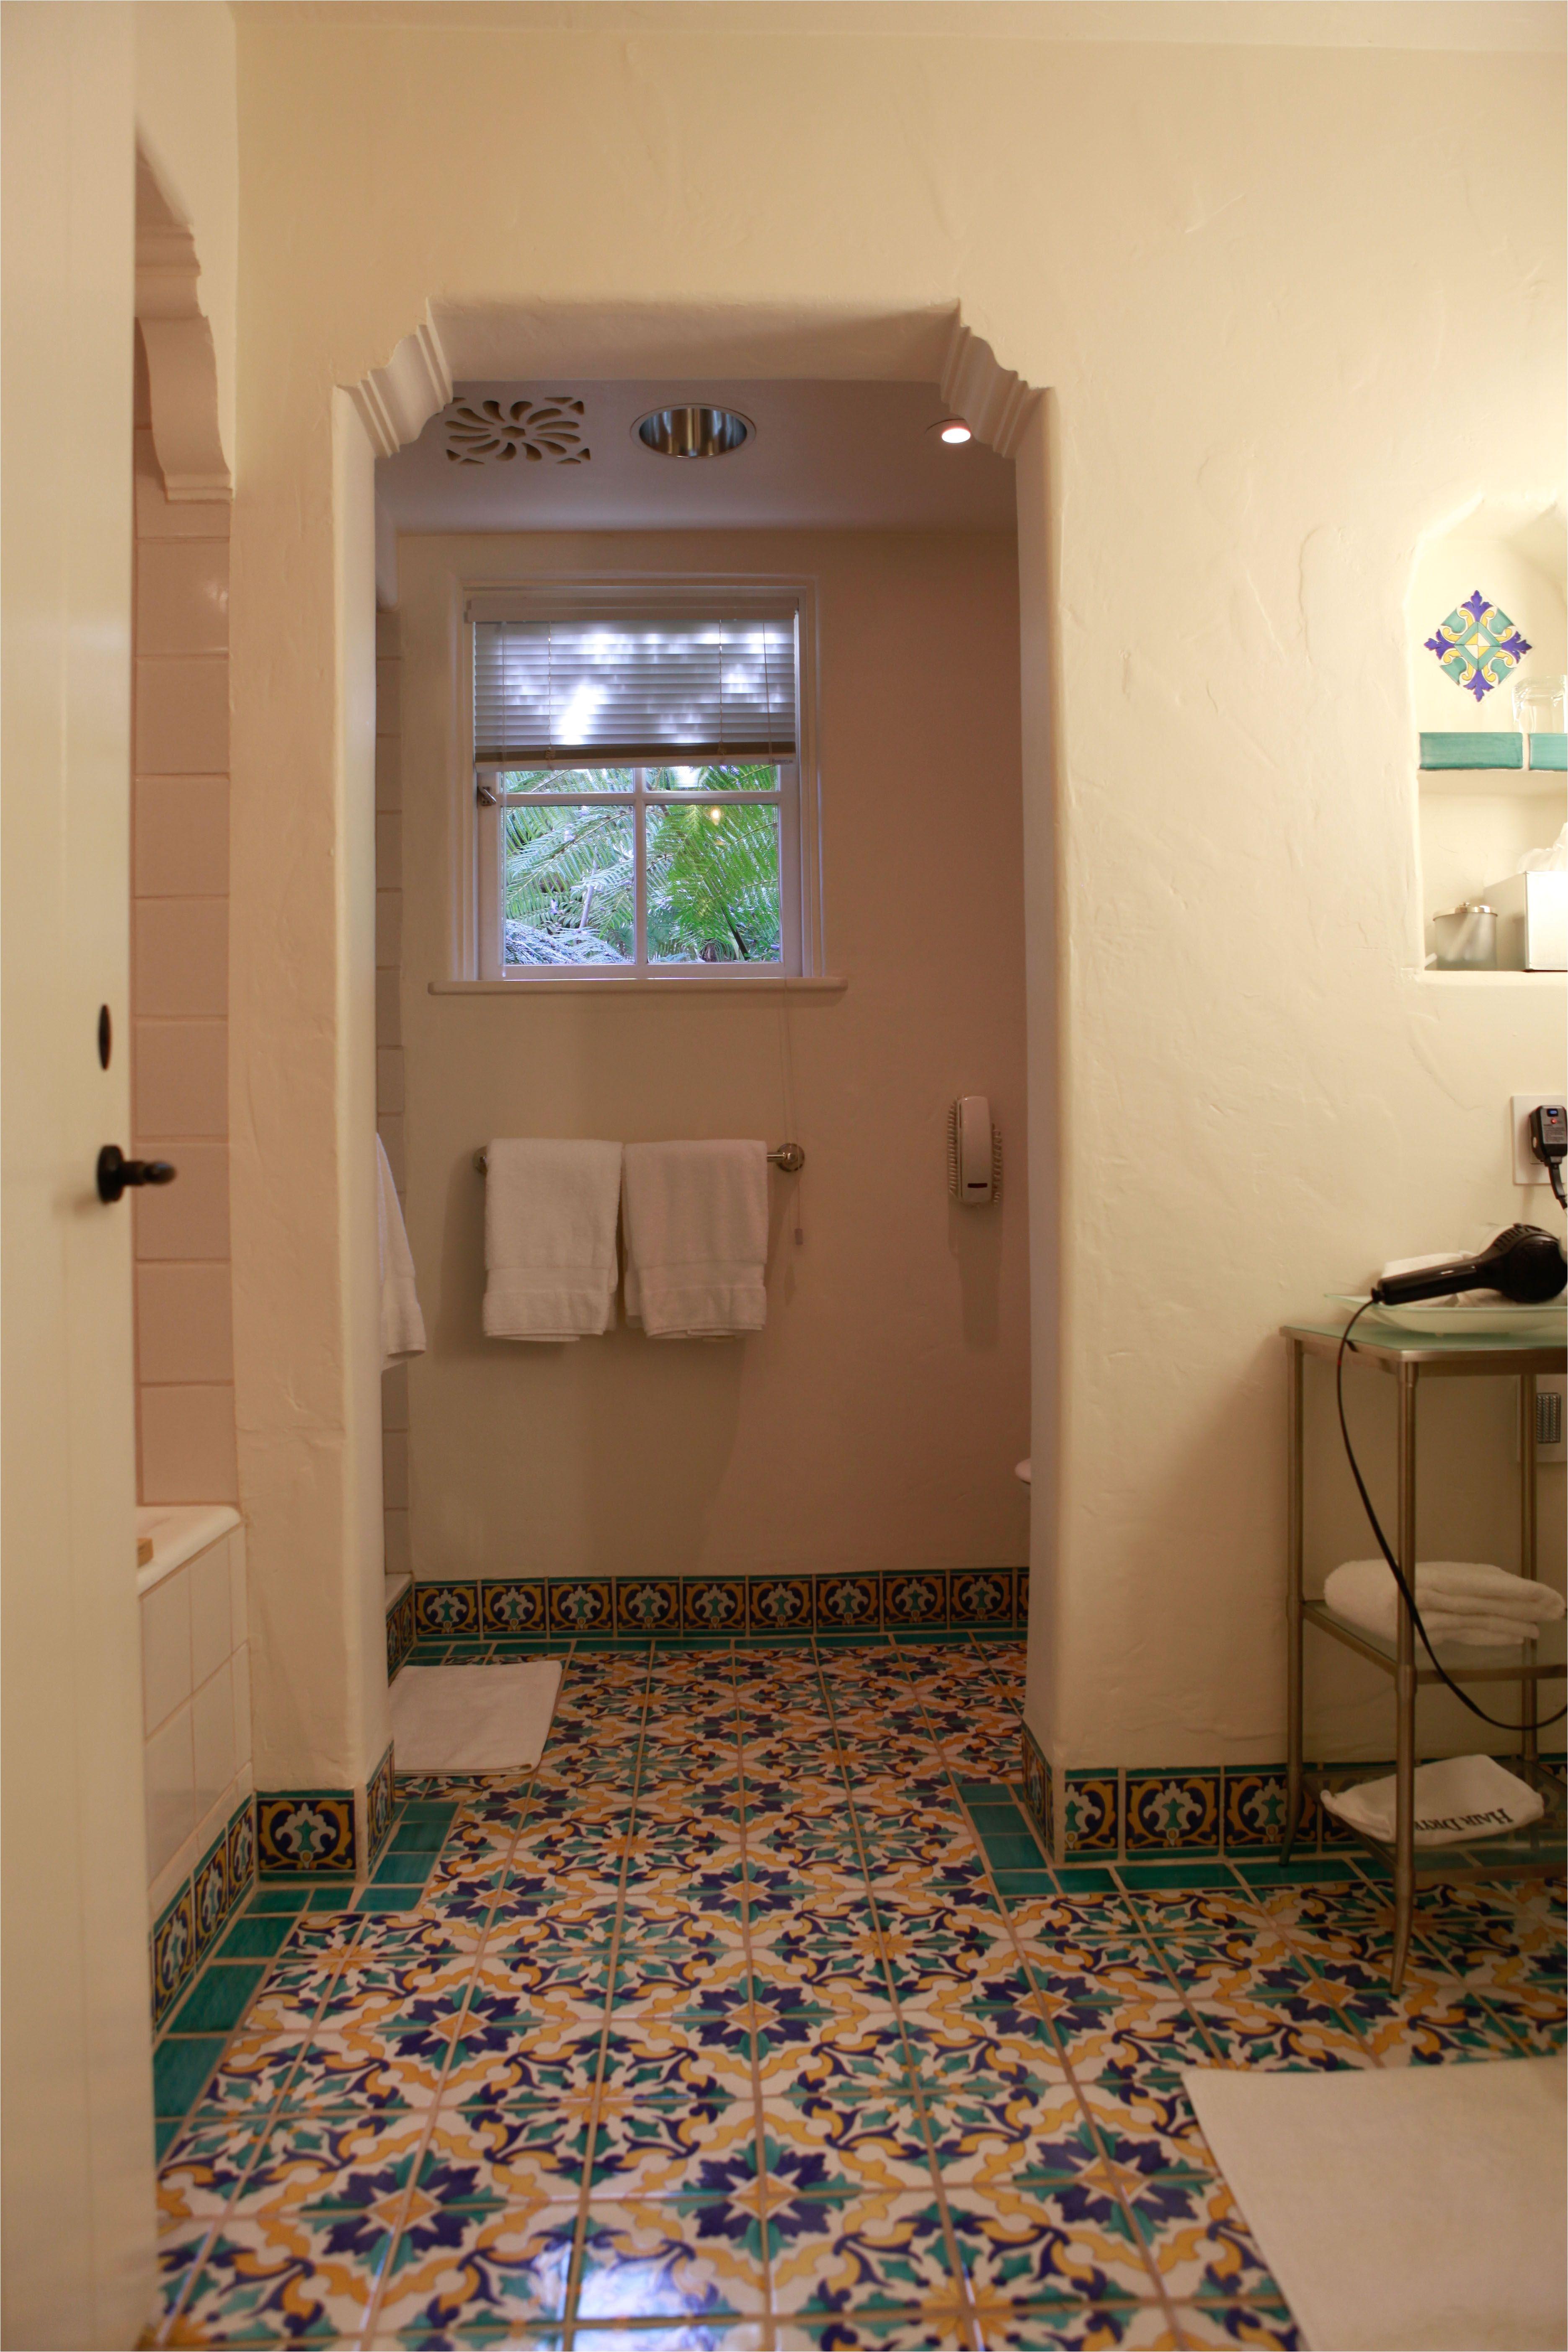 Love the tile floor in this bathroom of the Four Seasons Biltmore in Santa Barbara